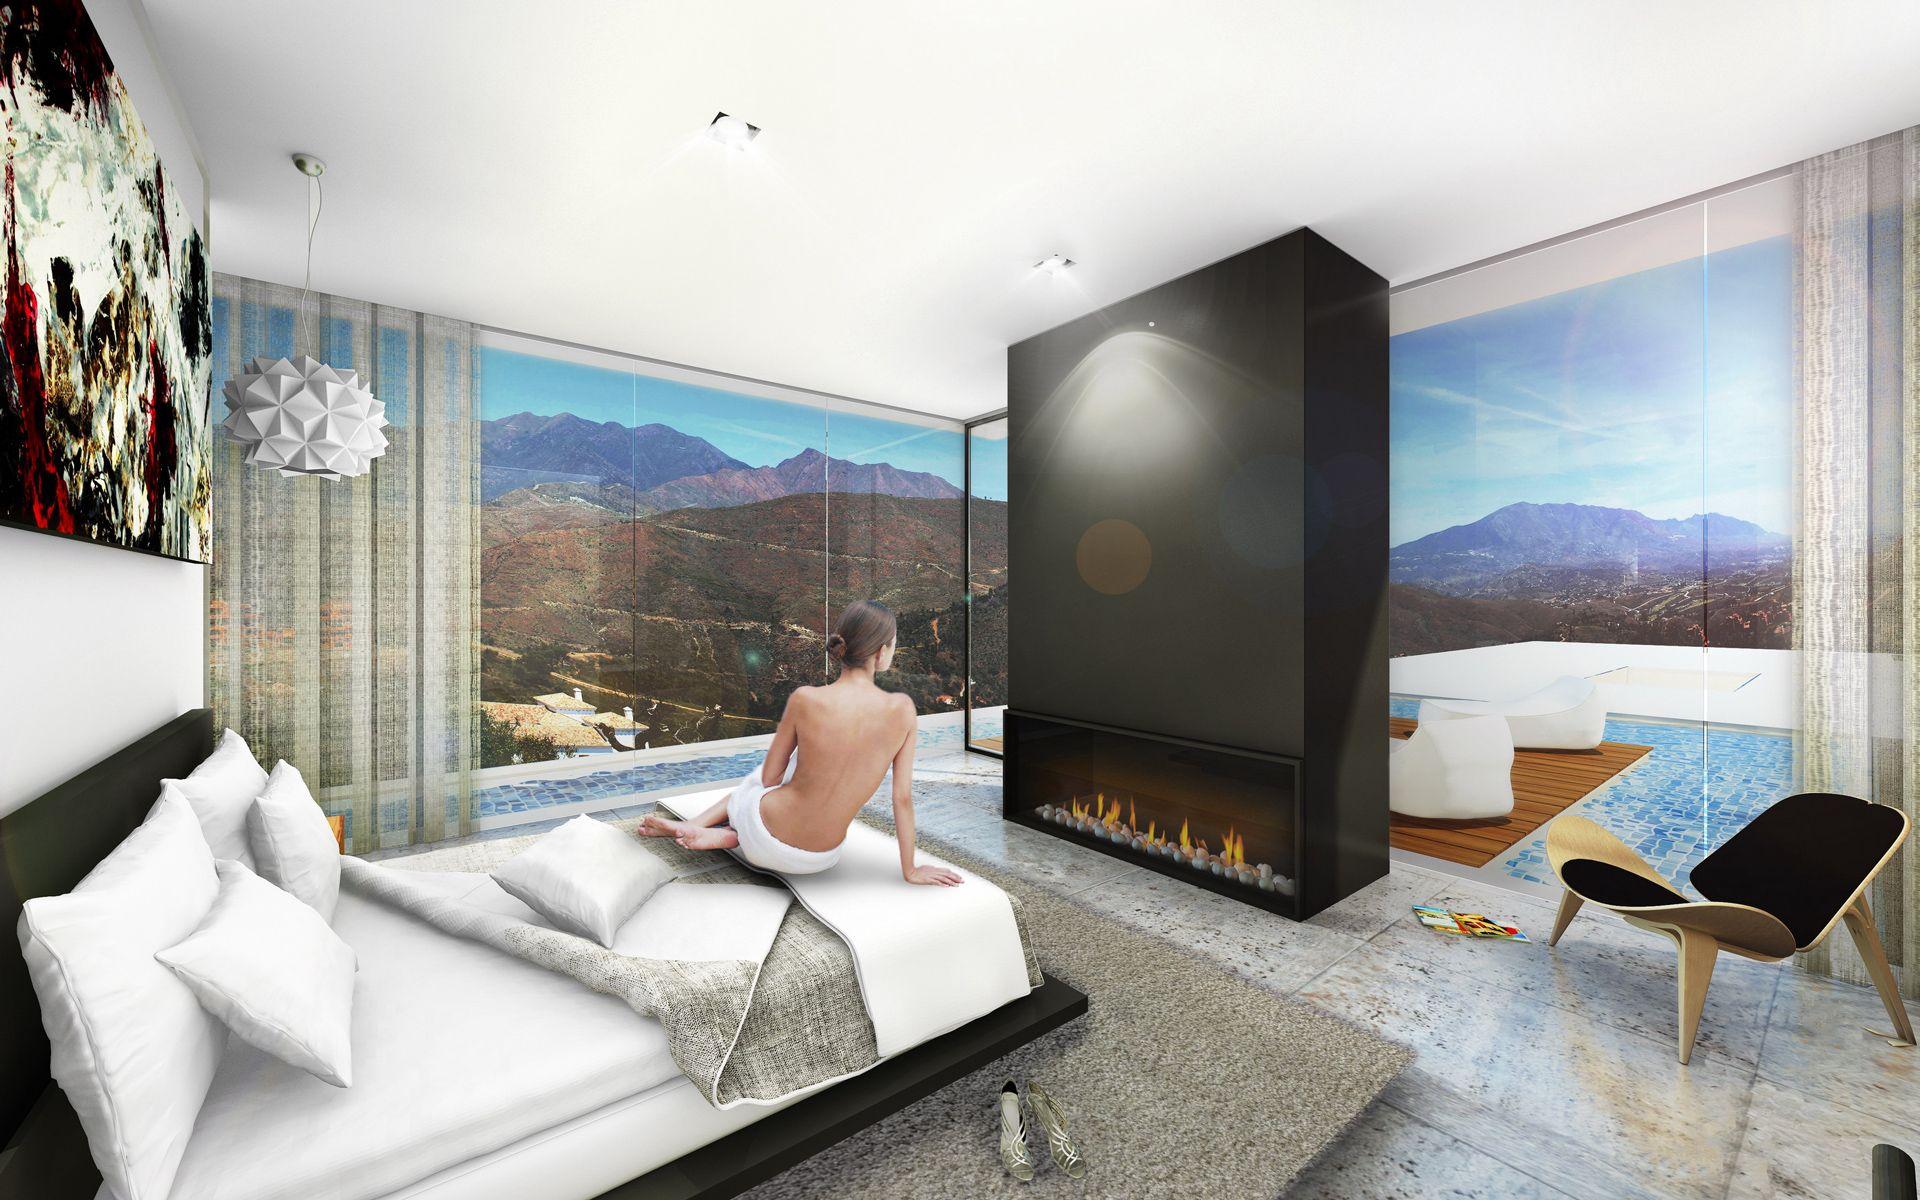 luxe moderne villa kopen aan de costa del sol spanje. Black Bedroom Furniture Sets. Home Design Ideas